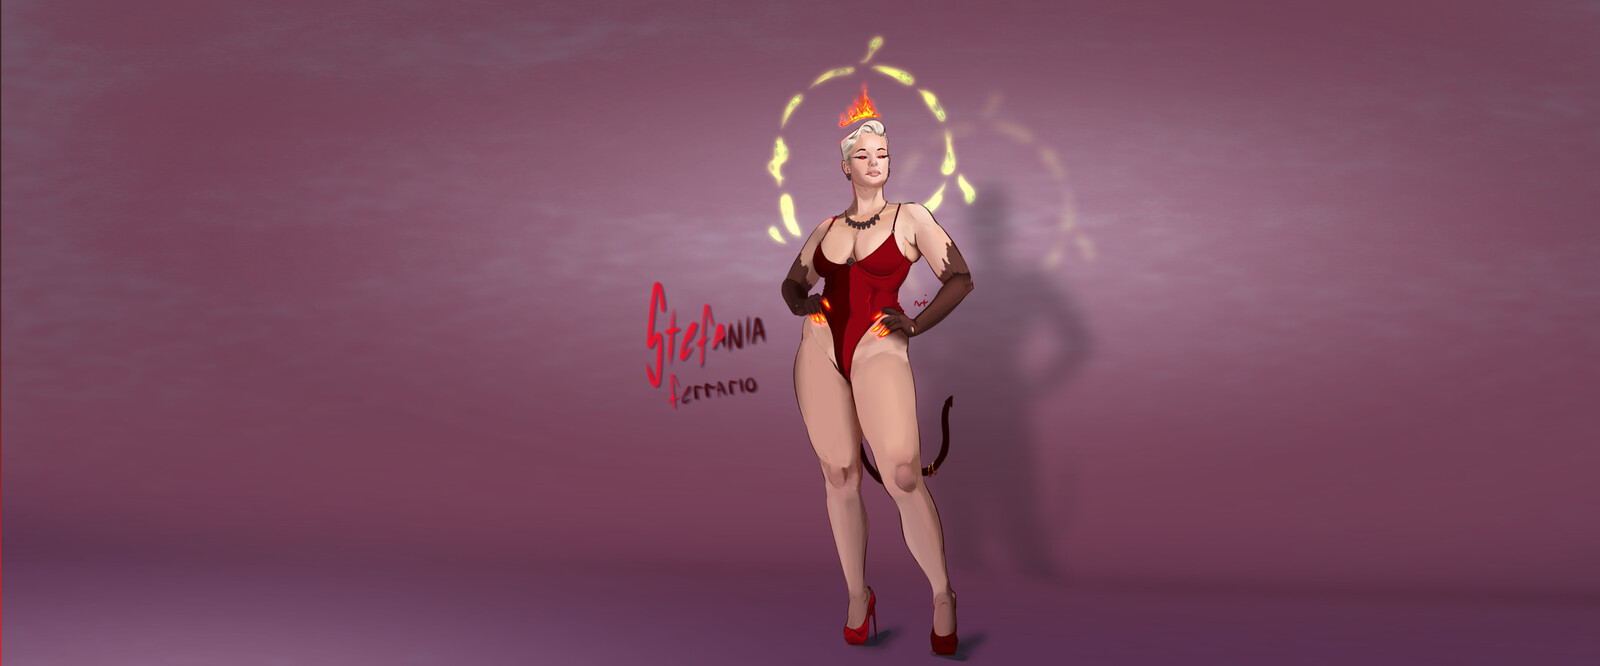 Satan's Princess - Stefania Ferrario